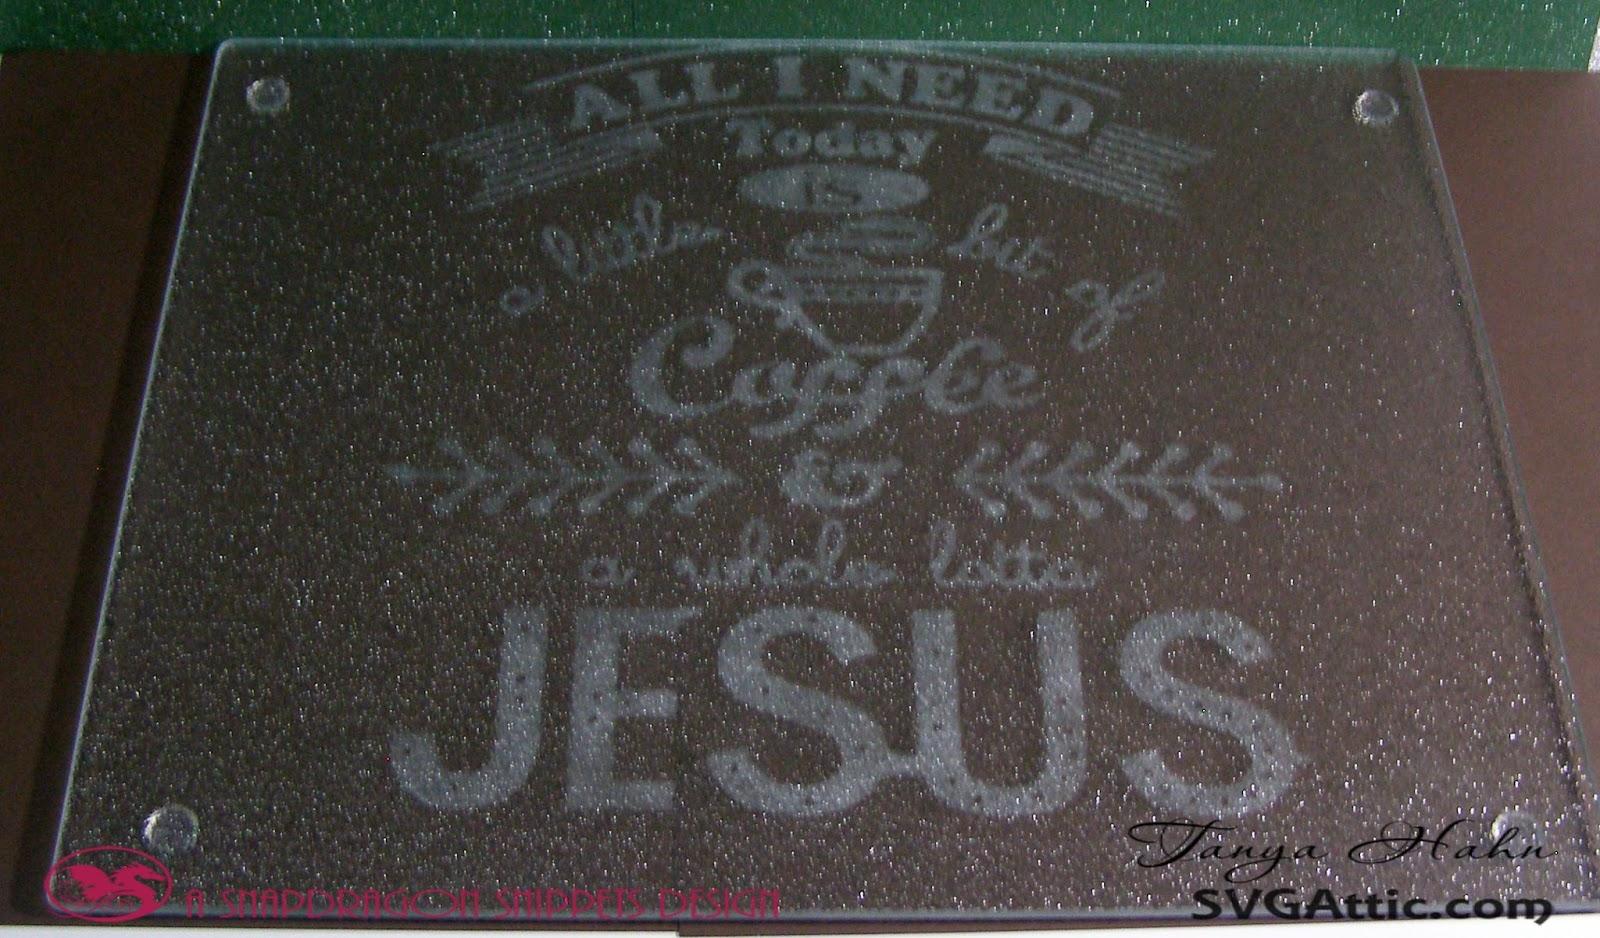 Svg Attic Blog Jesus Amp Coffee